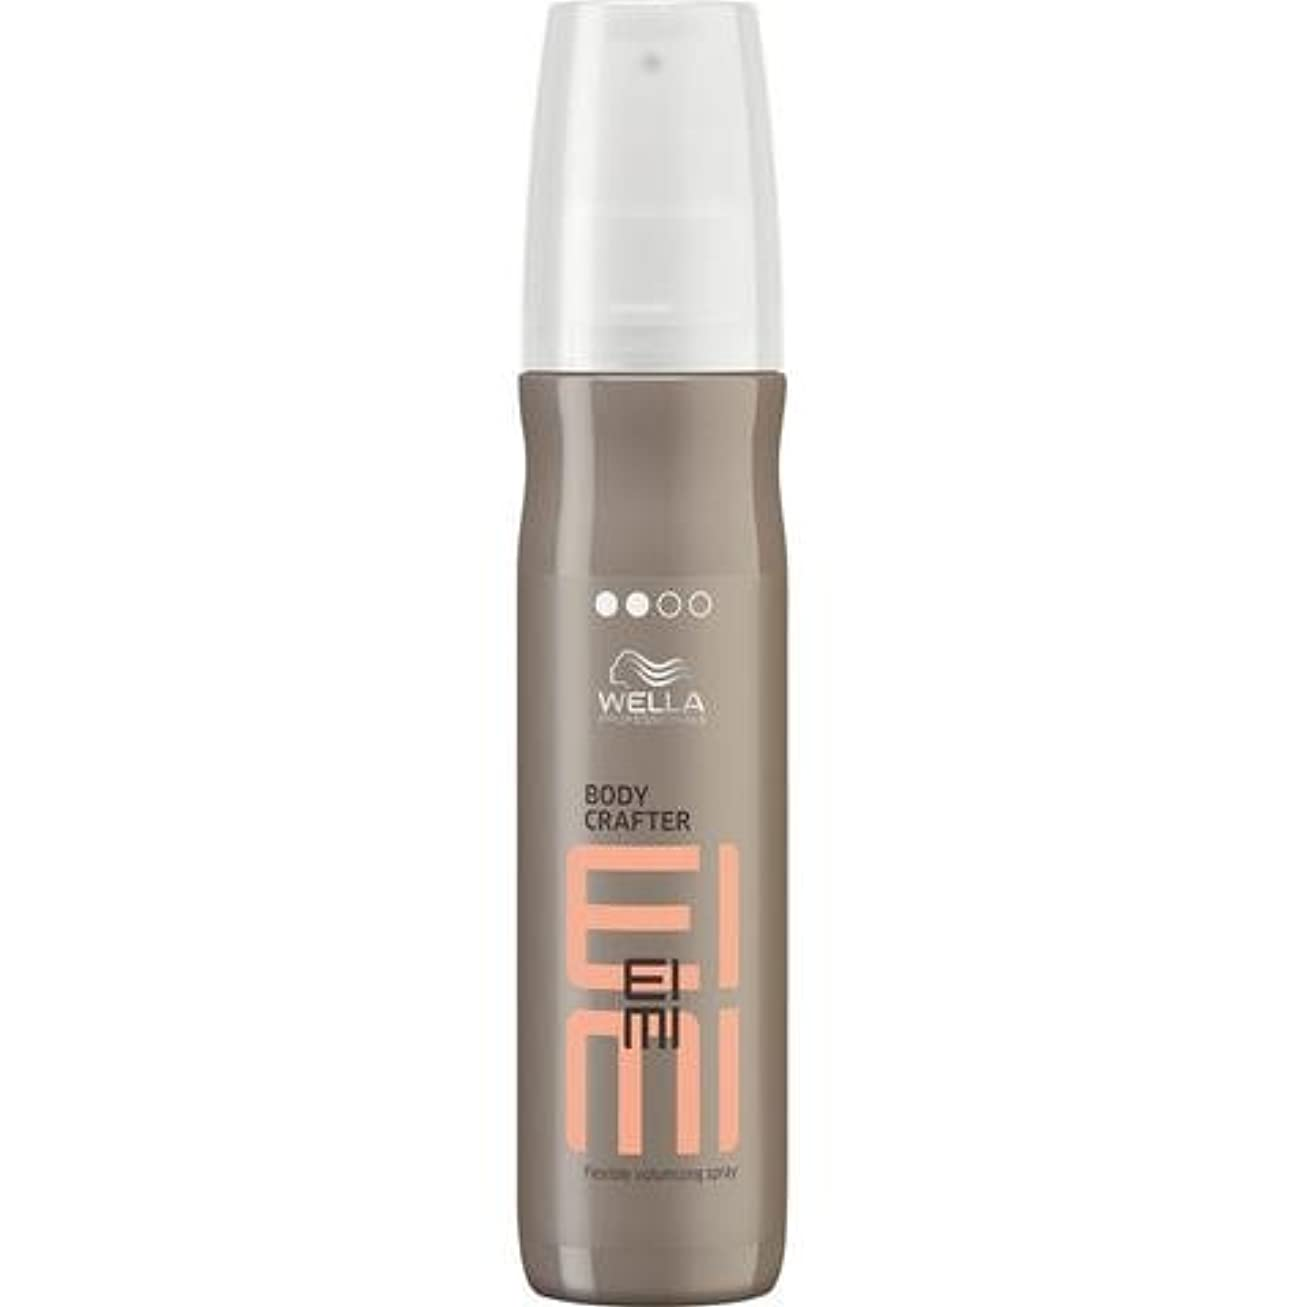 Wella EIMI Body Crafter Flexible Volumising Spray 150 ml [並行輸入品]